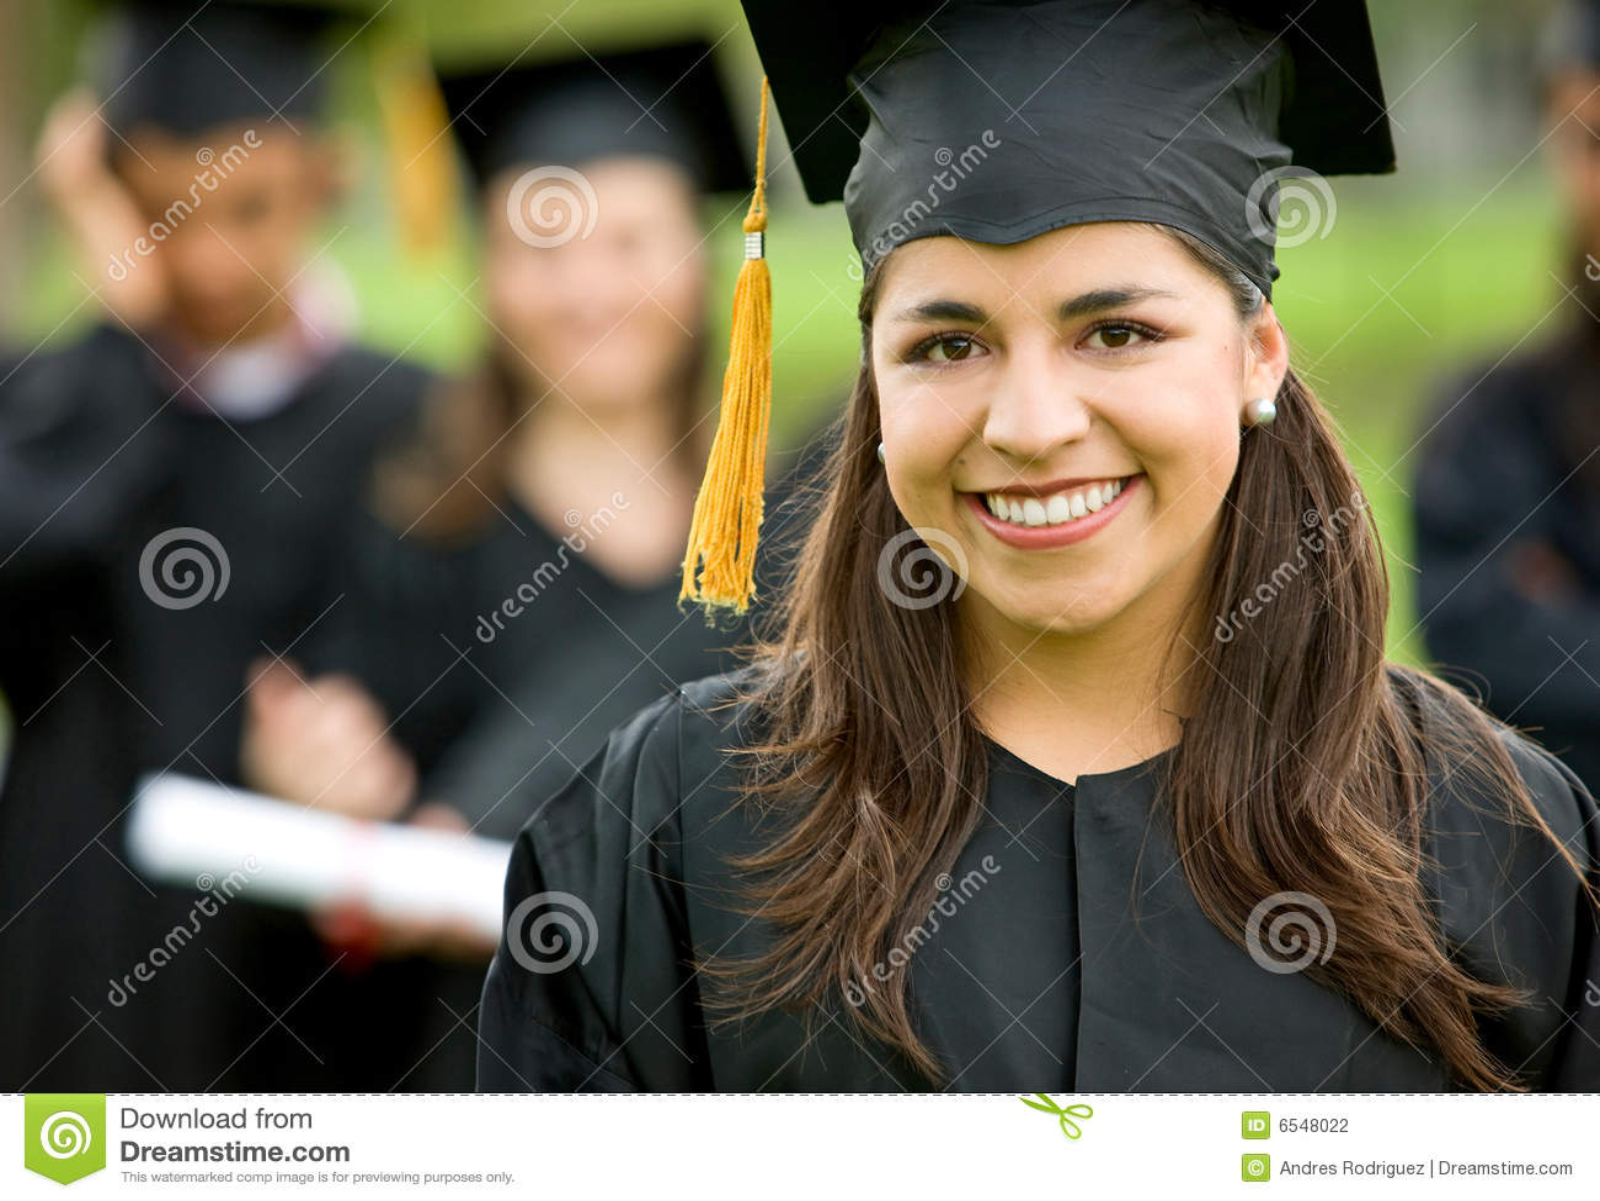 Graduation Group 98